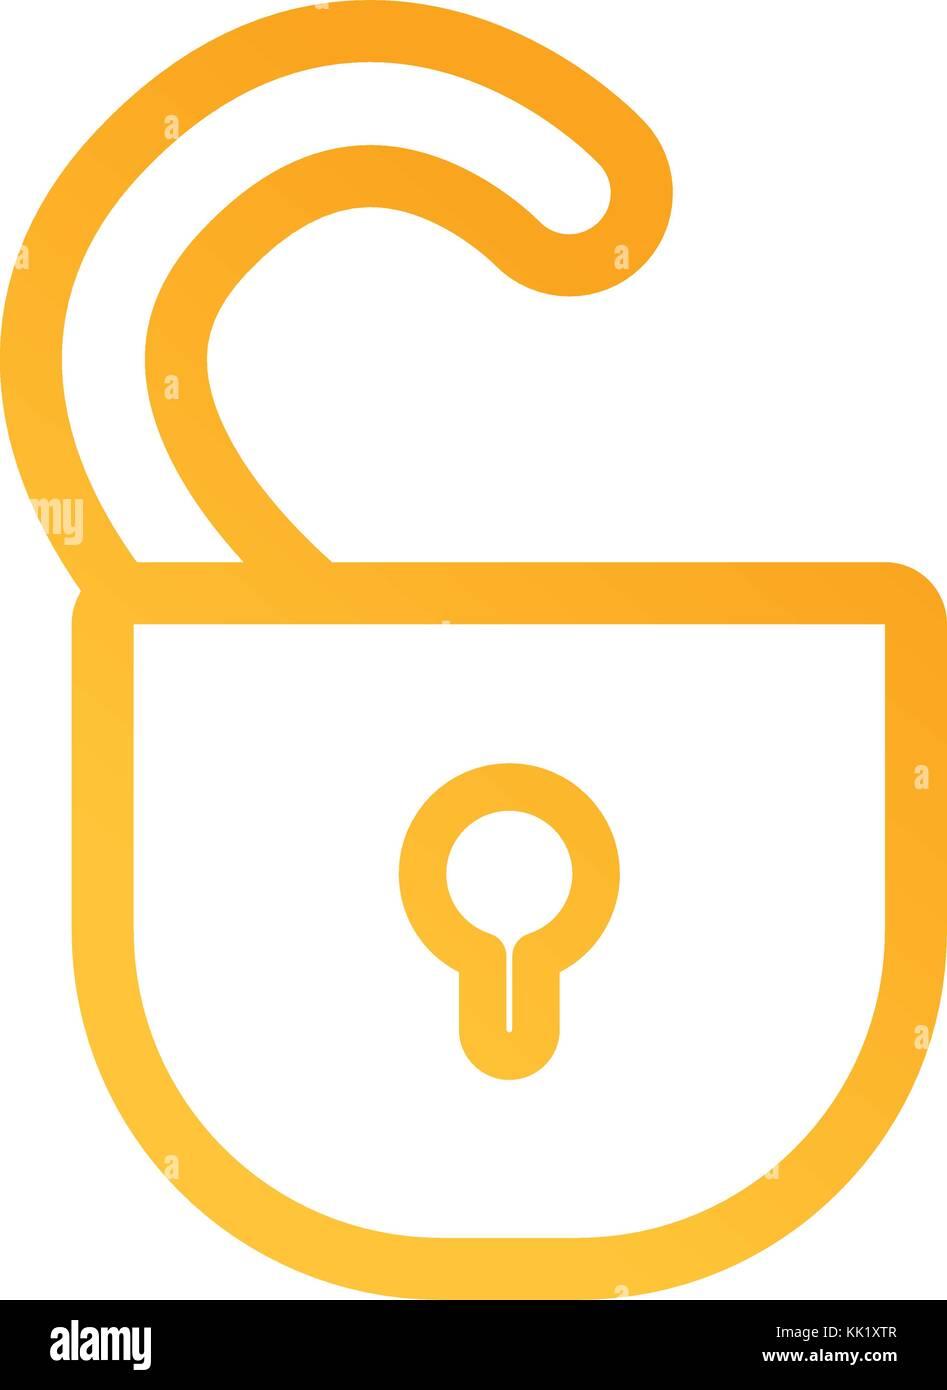 open padlock icon image - Stock Image